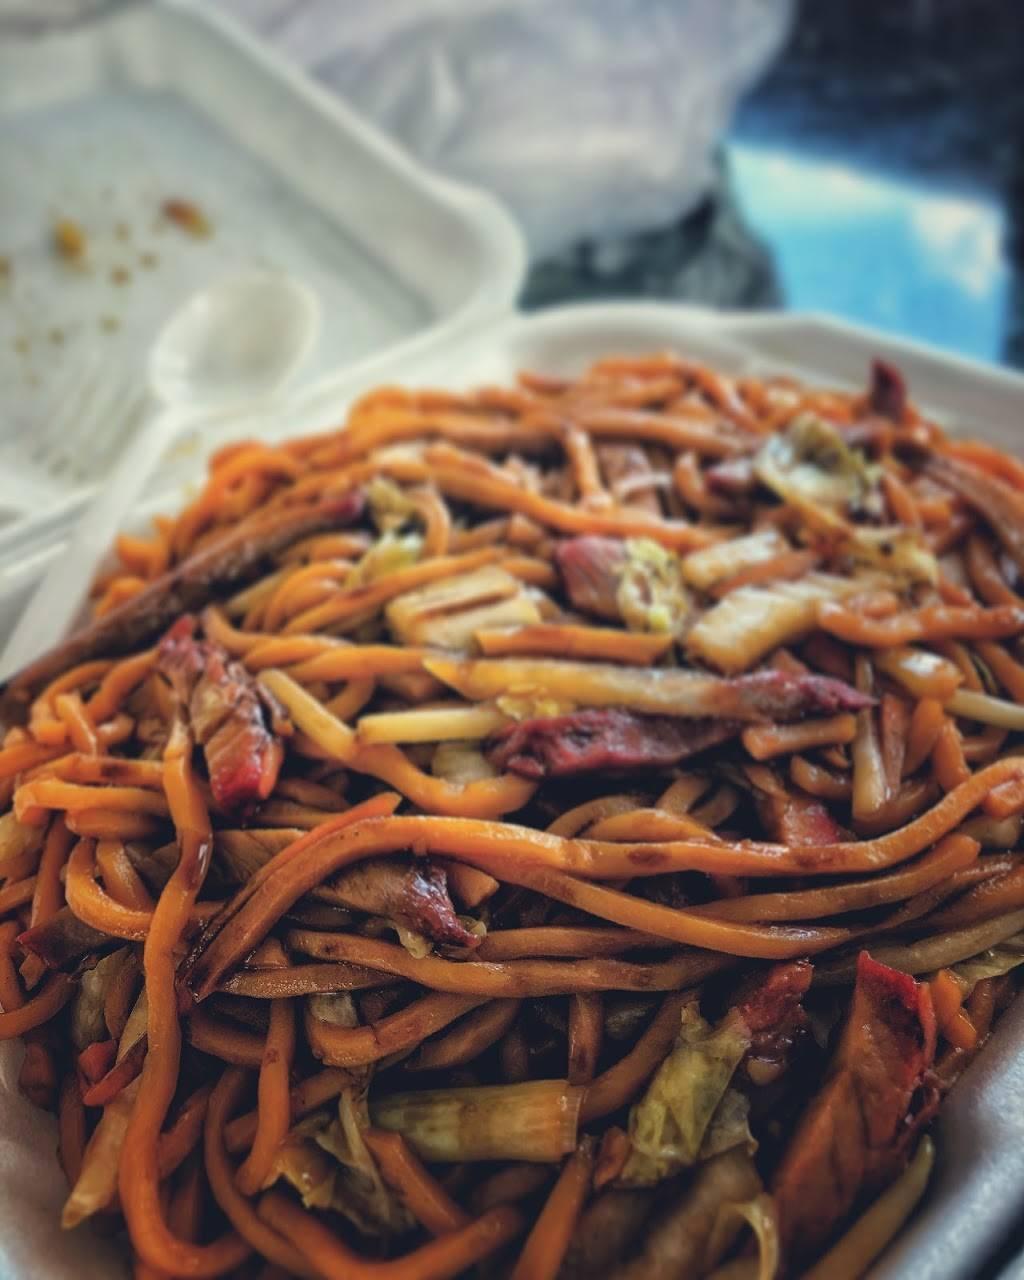 Peking King Restaurant - restaurant  | Photo 7 of 9 | Address: 6936 N 56th St, Tampa, FL 33617, USA | Phone: (813) 899-9888